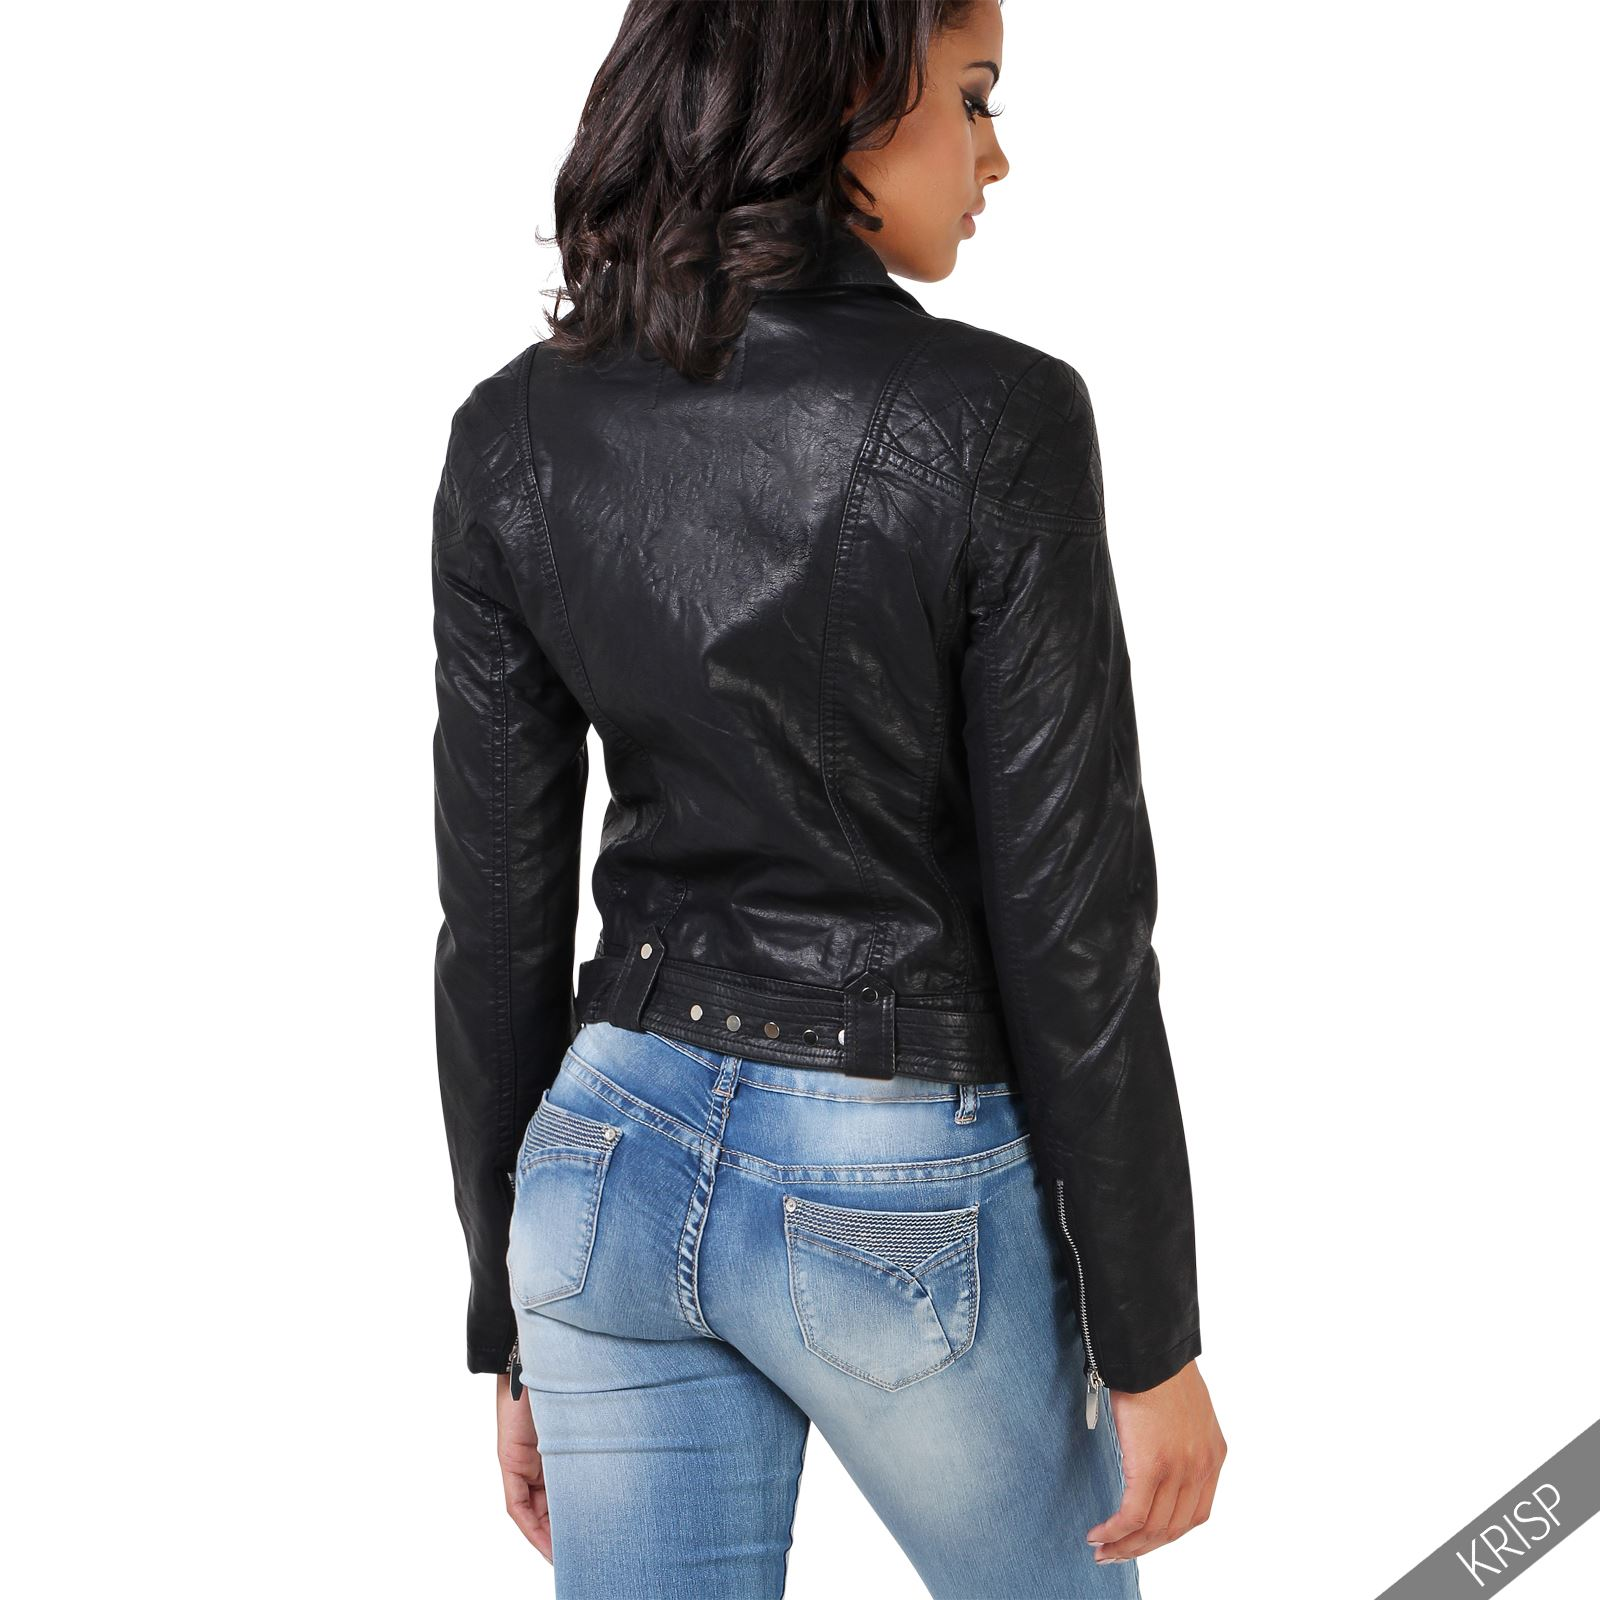 femmes veste biker casual matelass e clous sexy cuir. Black Bedroom Furniture Sets. Home Design Ideas